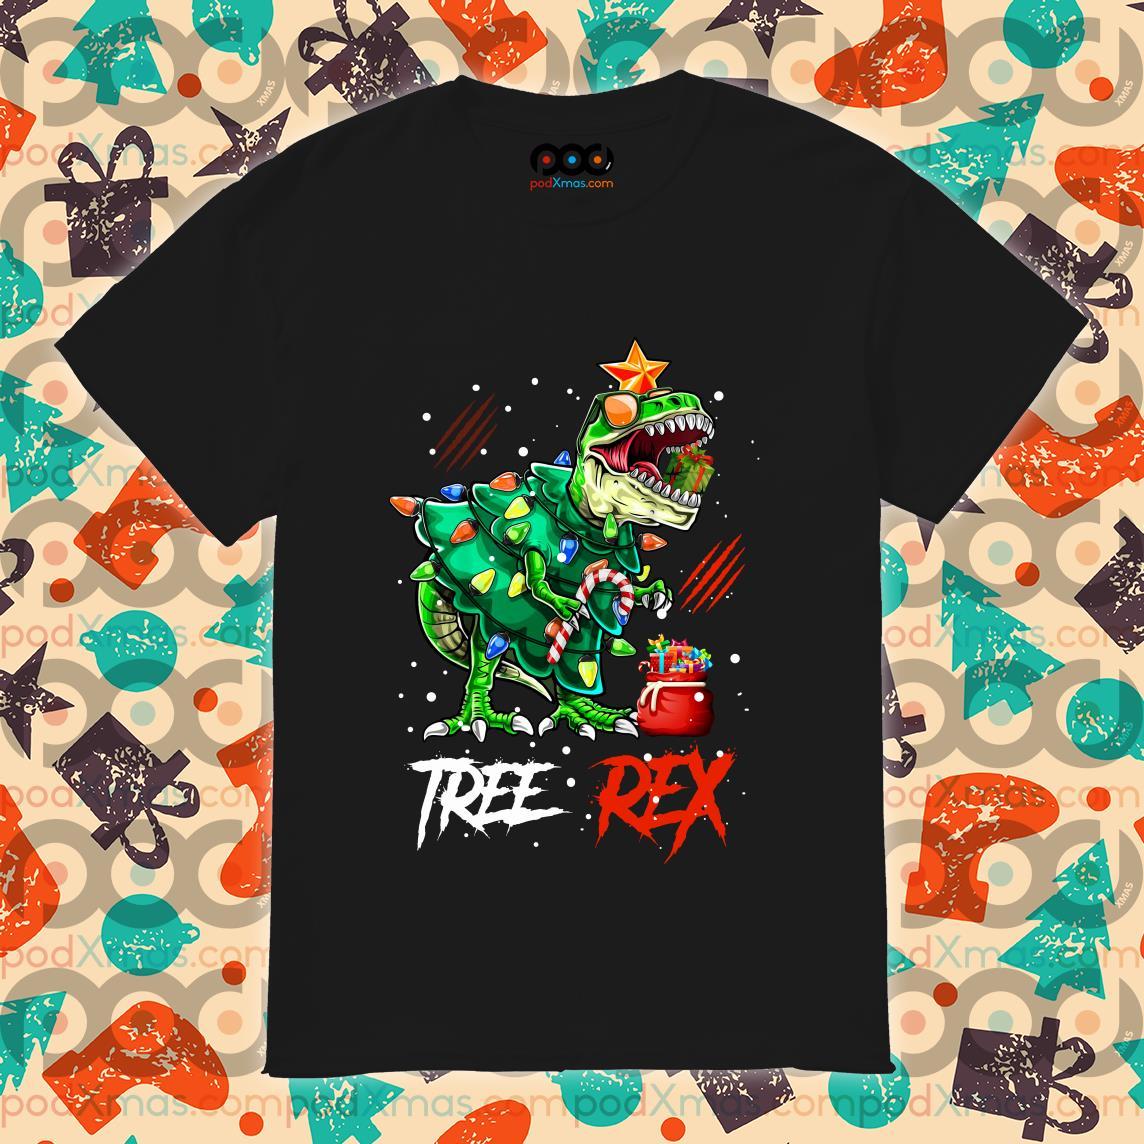 Tree Rex T-rex Christmas Dinosaur Shirt